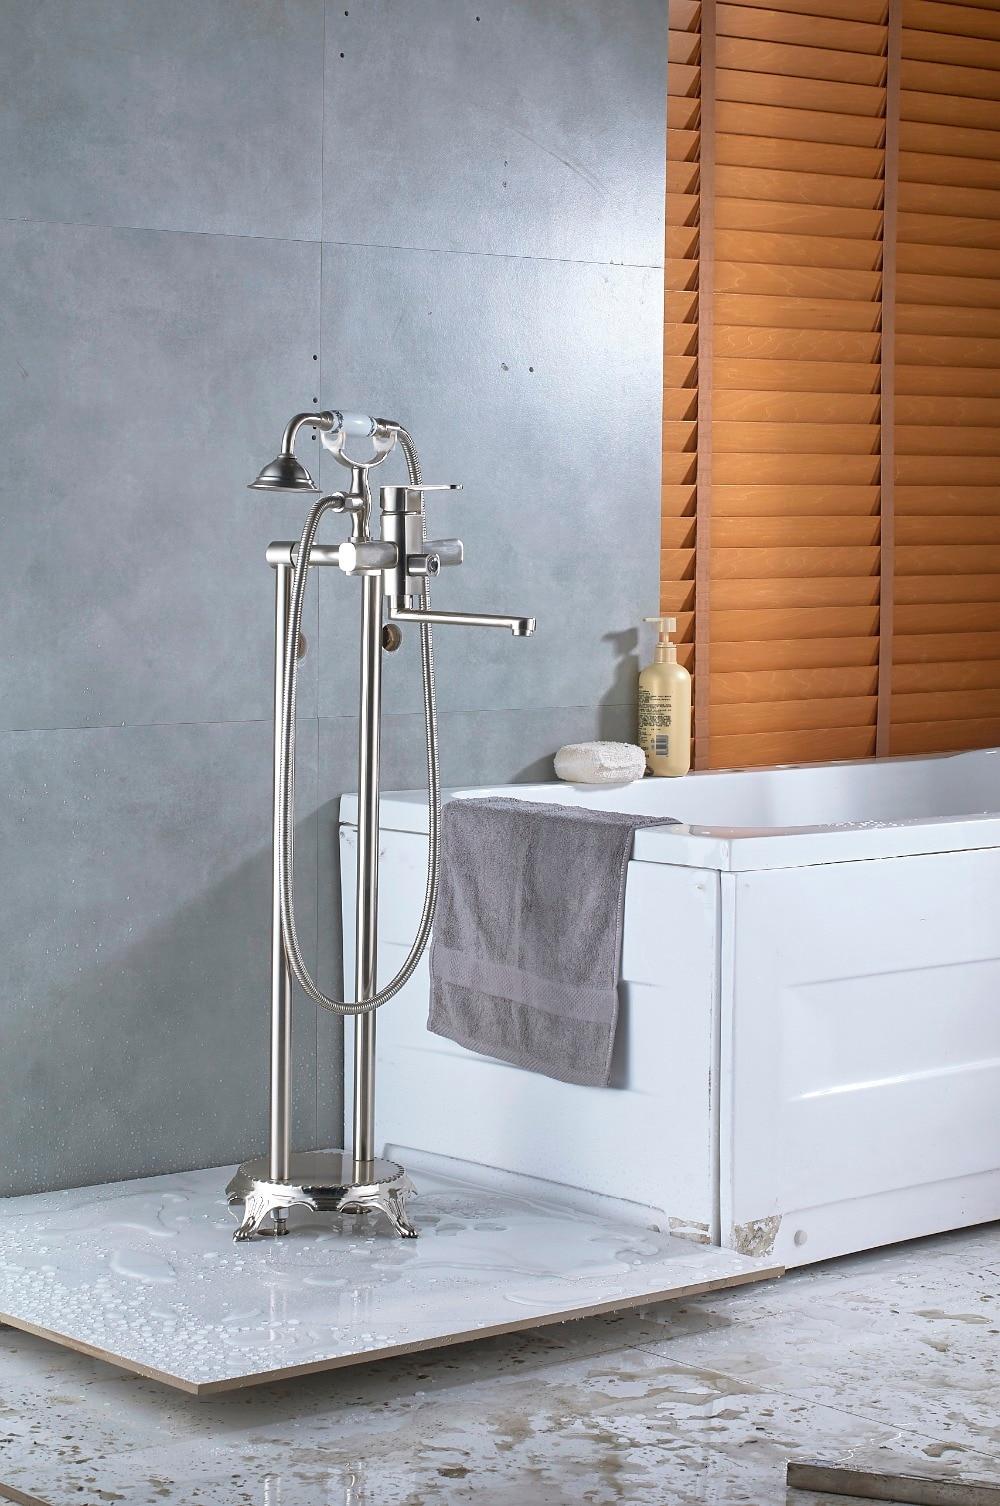 Quyanre Black Brushed Bathtub Floor Standing Faucet Creamic ...